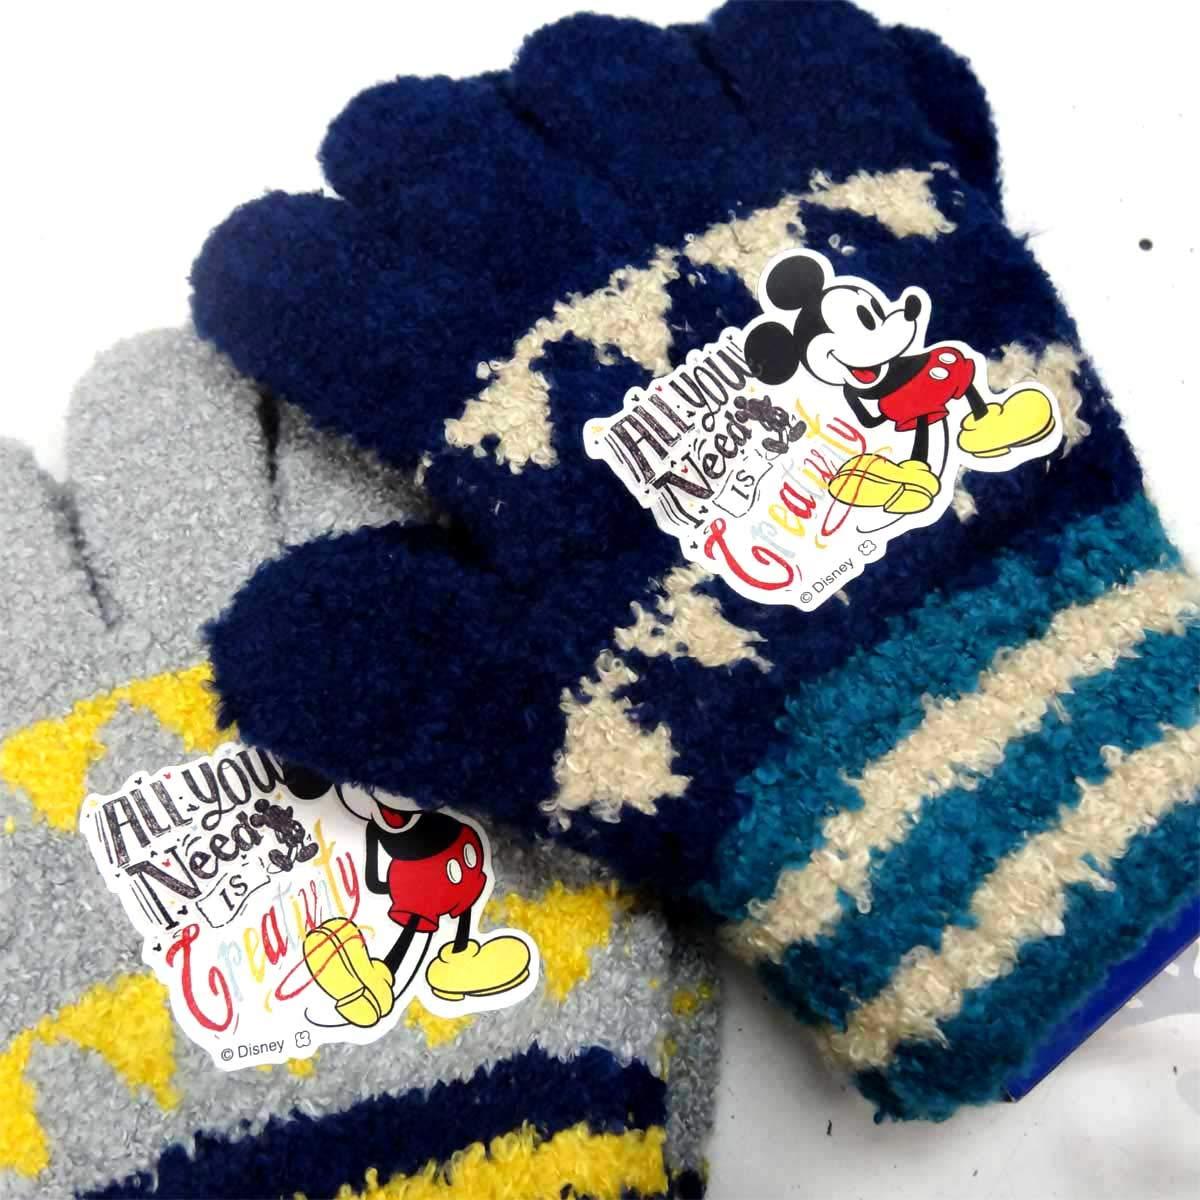 94030e0ac1d252 Amazon | J Bridge Western 日本製 子供用 手袋 キッズグローブ 五指 ミッキー 6191-101 No.2 紺 | 手袋 通販